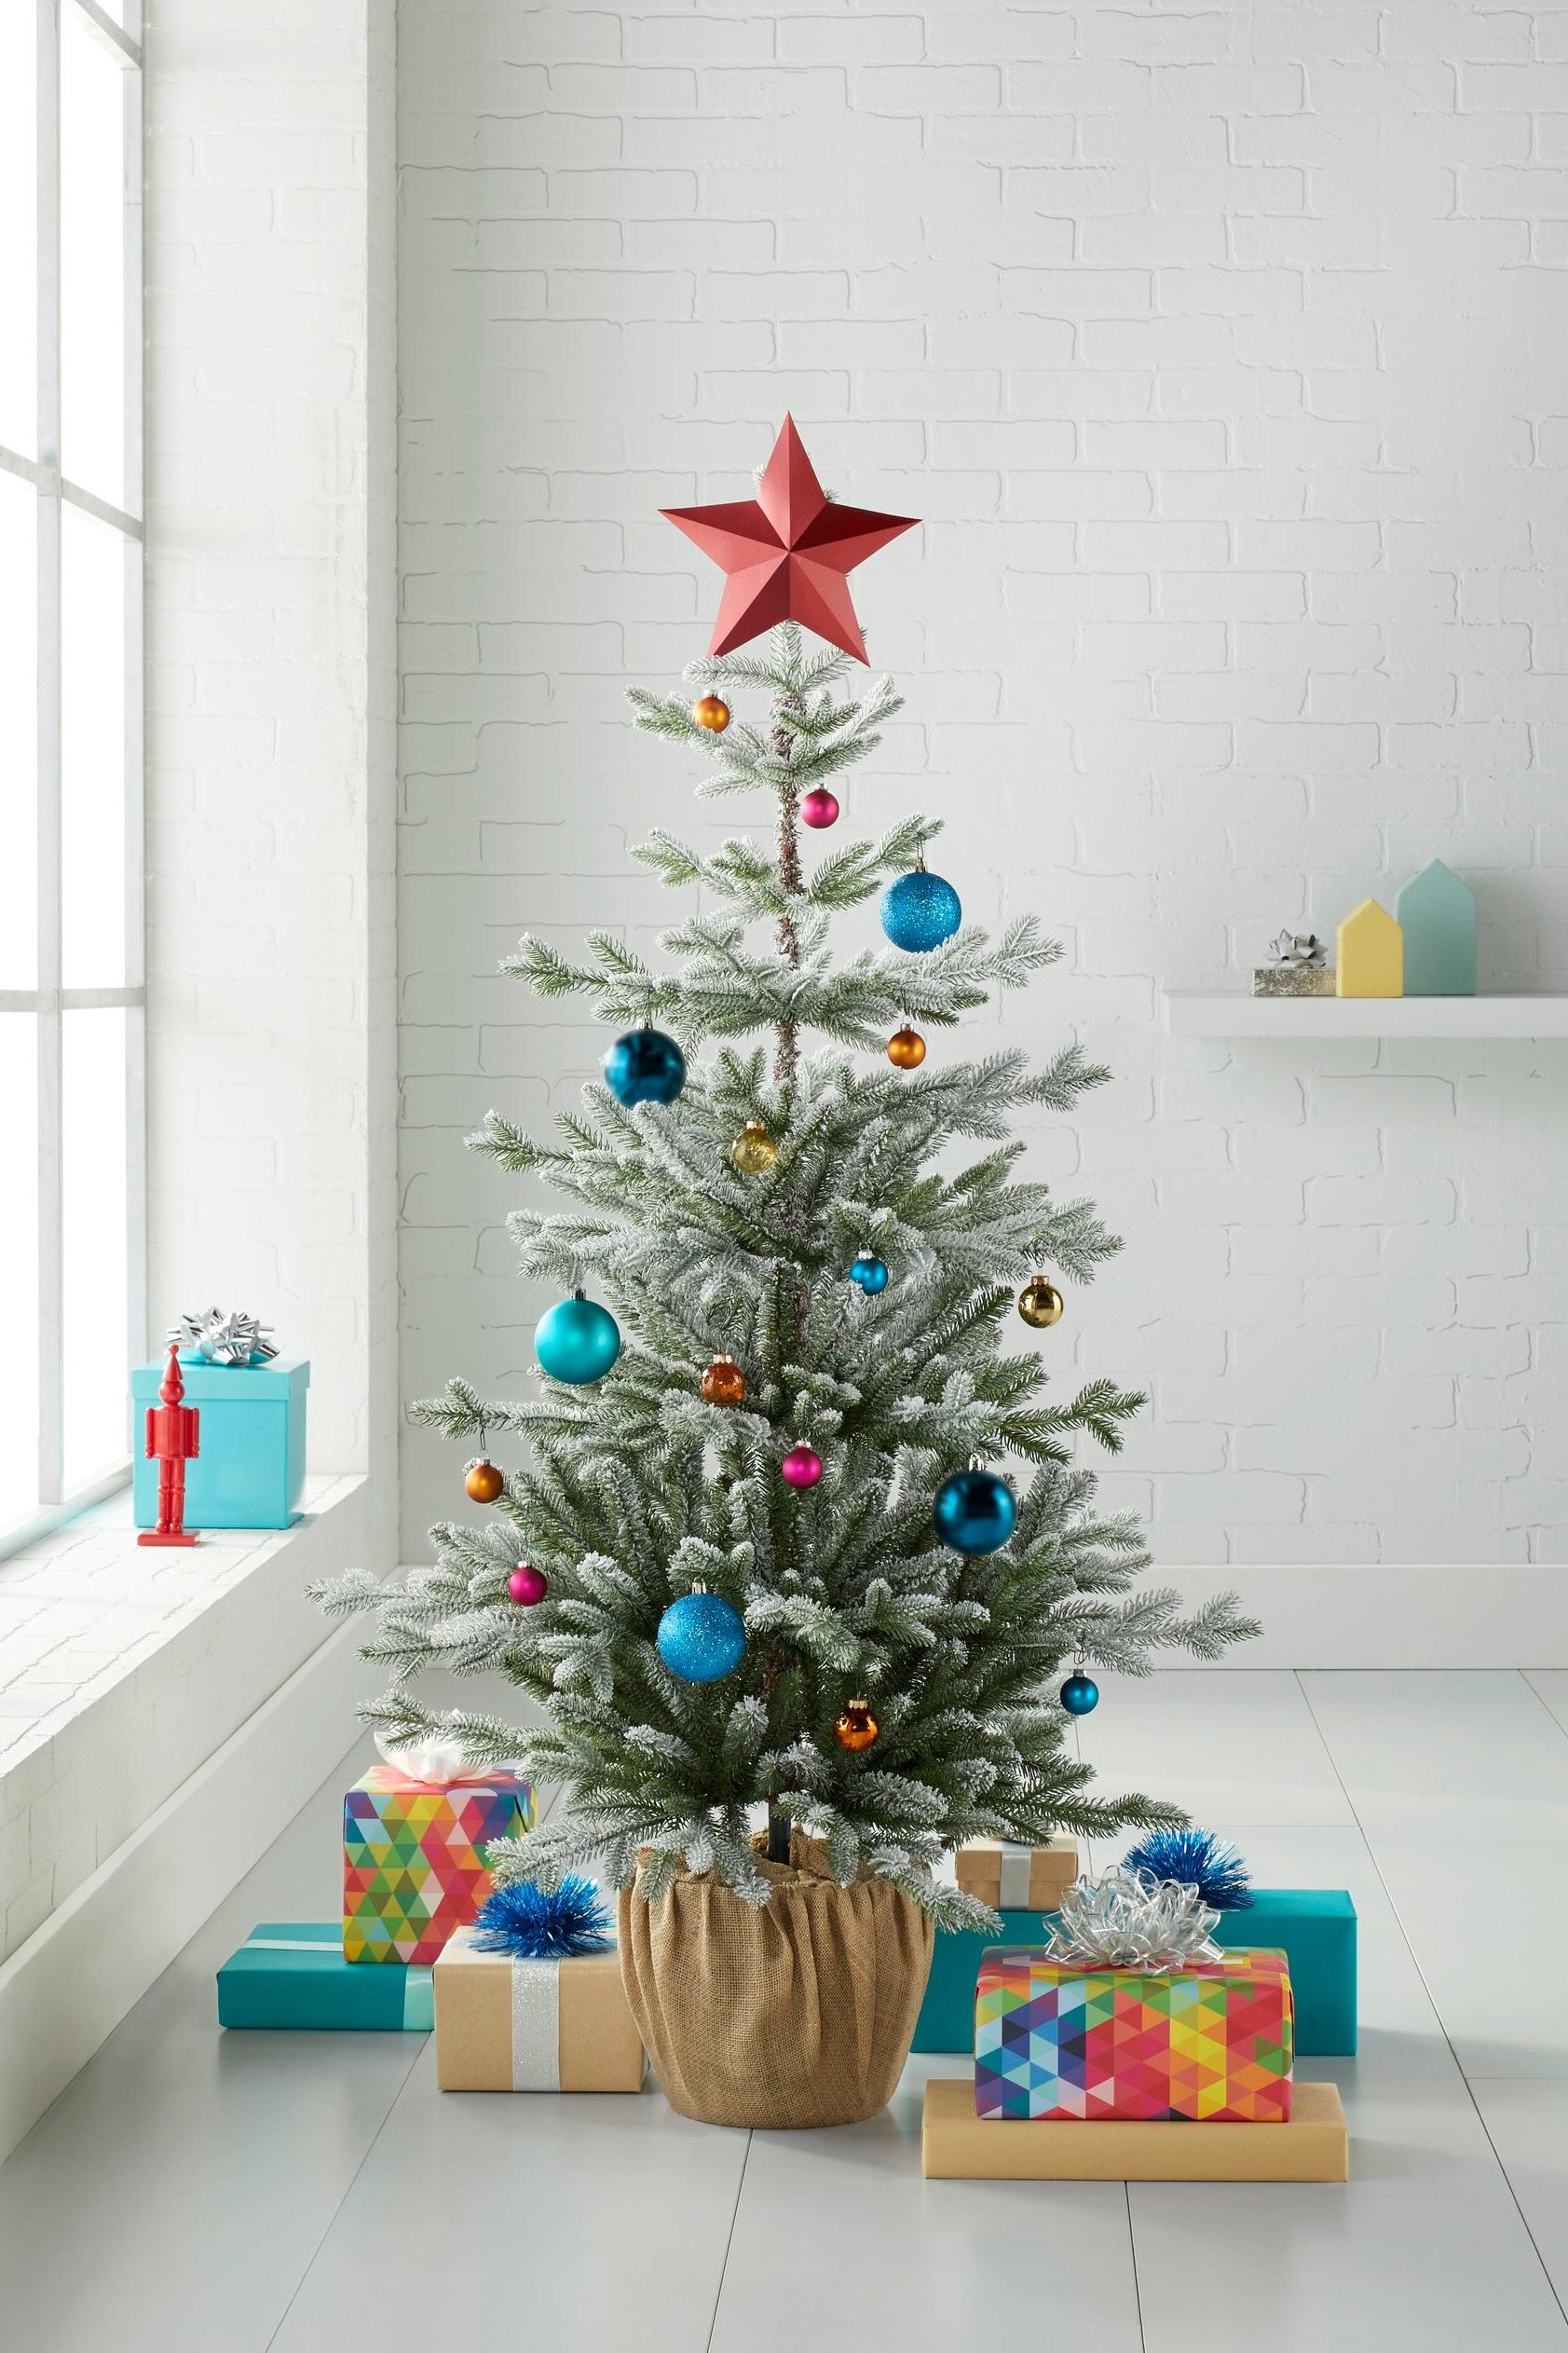 C-000696-01-043_051-01-2907_52%22 Unlit Balsam FLOCKED Porch Pine 30%22Dia.jpg